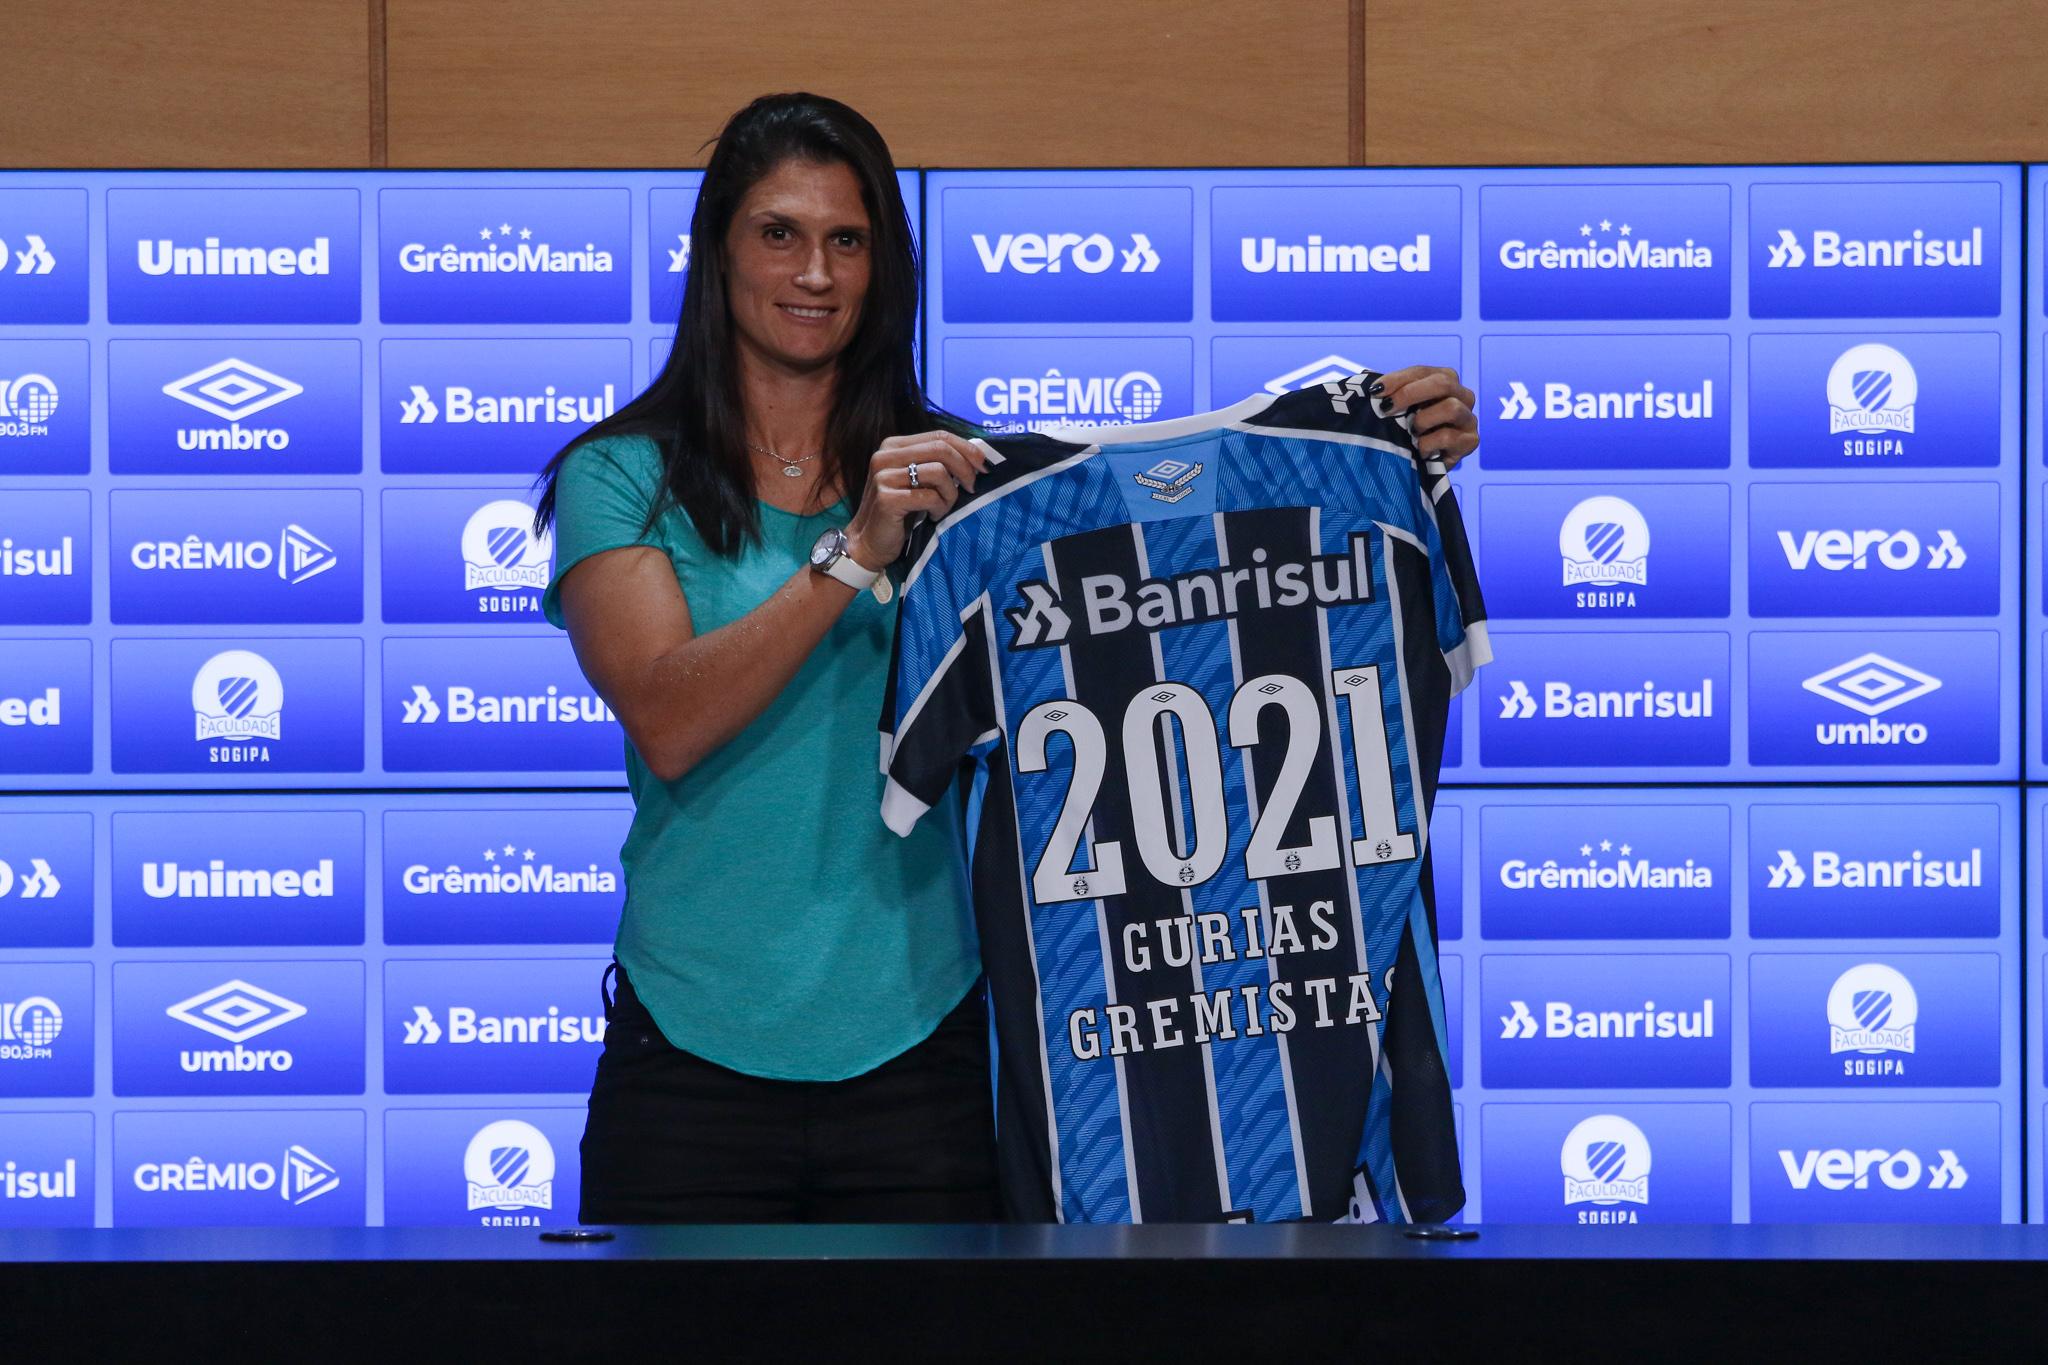 Grêmio anuncia zagueira Andréia Rosa para temporada 2021 - Olimpia Sports